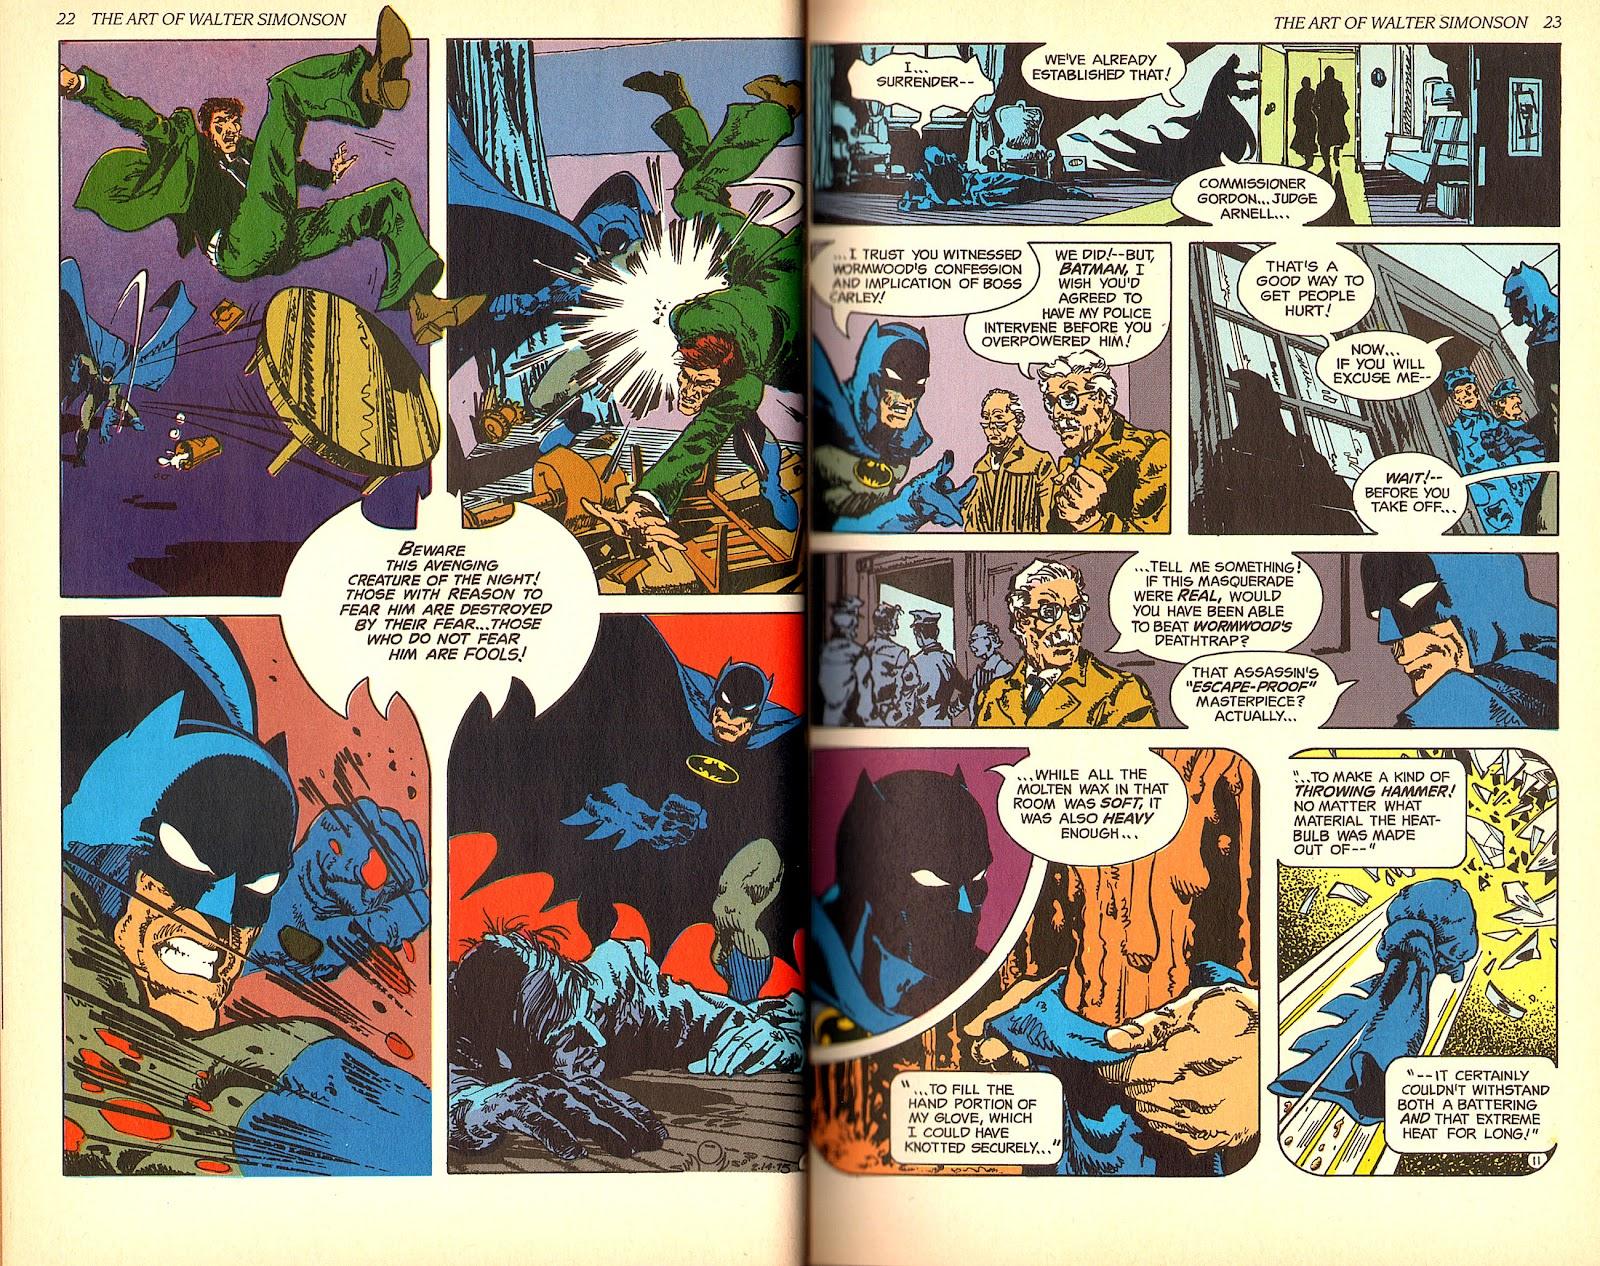 Read online The Art of Walter Simonson comic -  Issue # TPB - 13